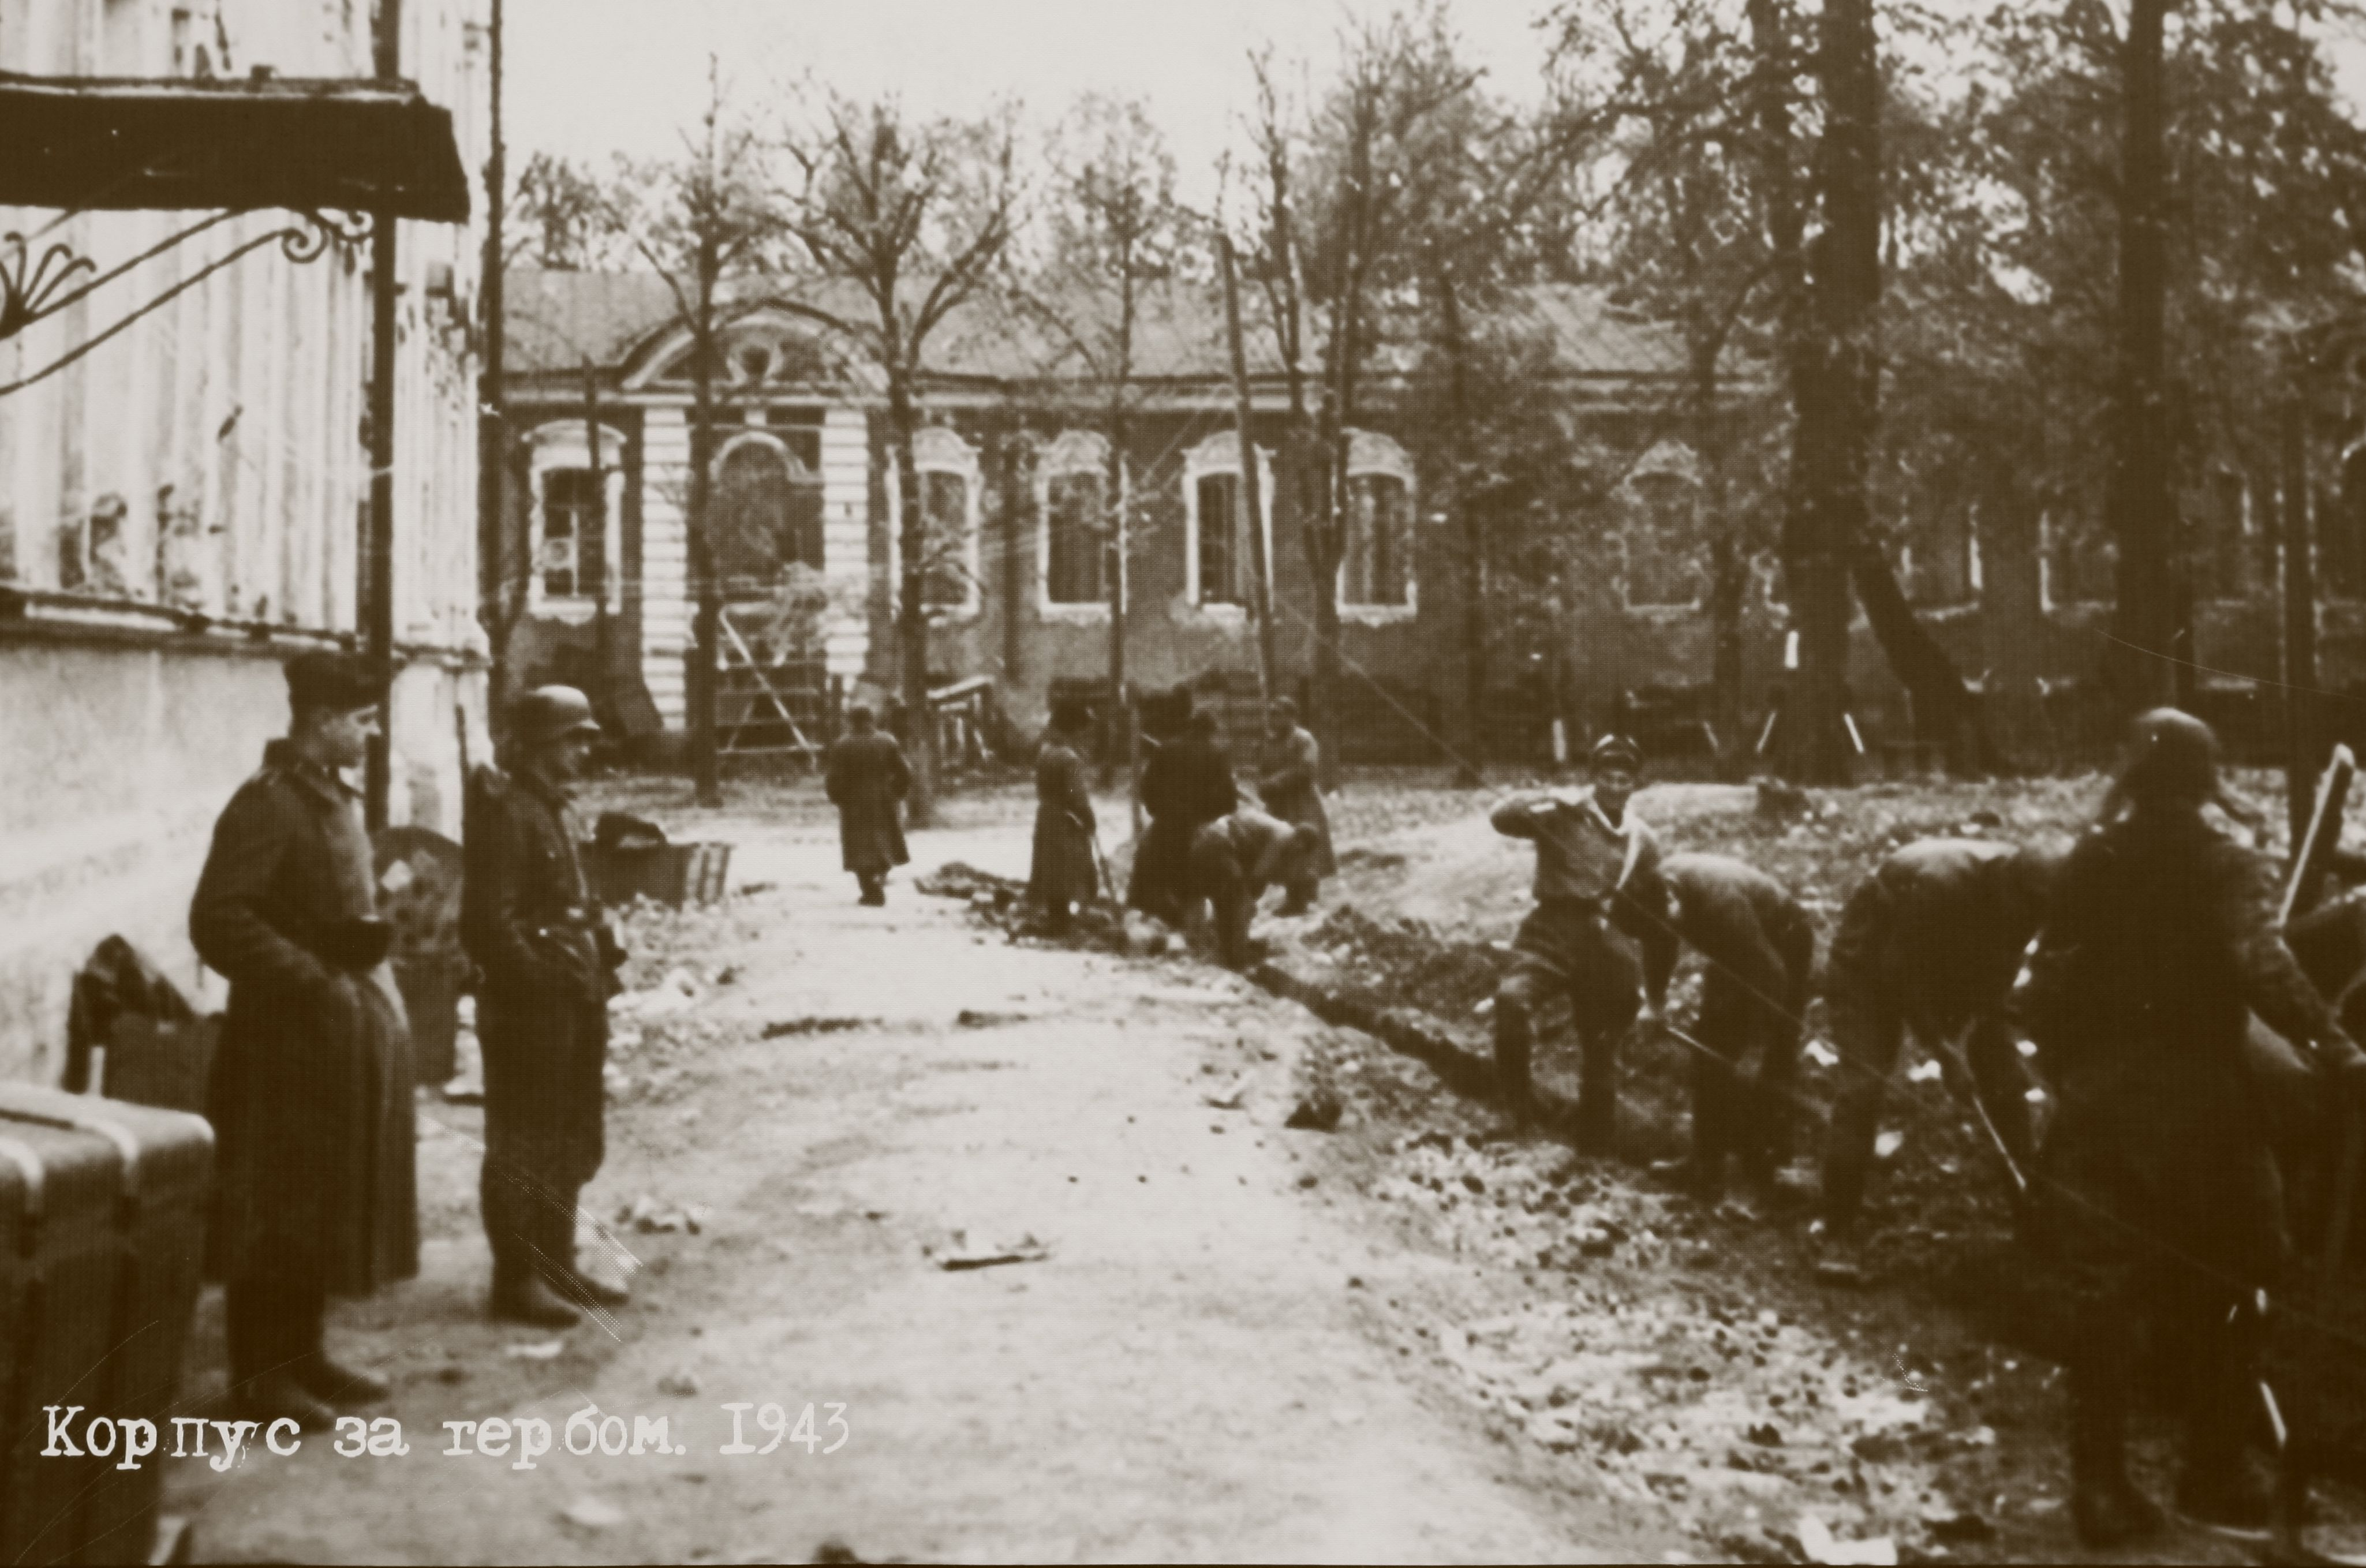 1943. Корпус за гербом